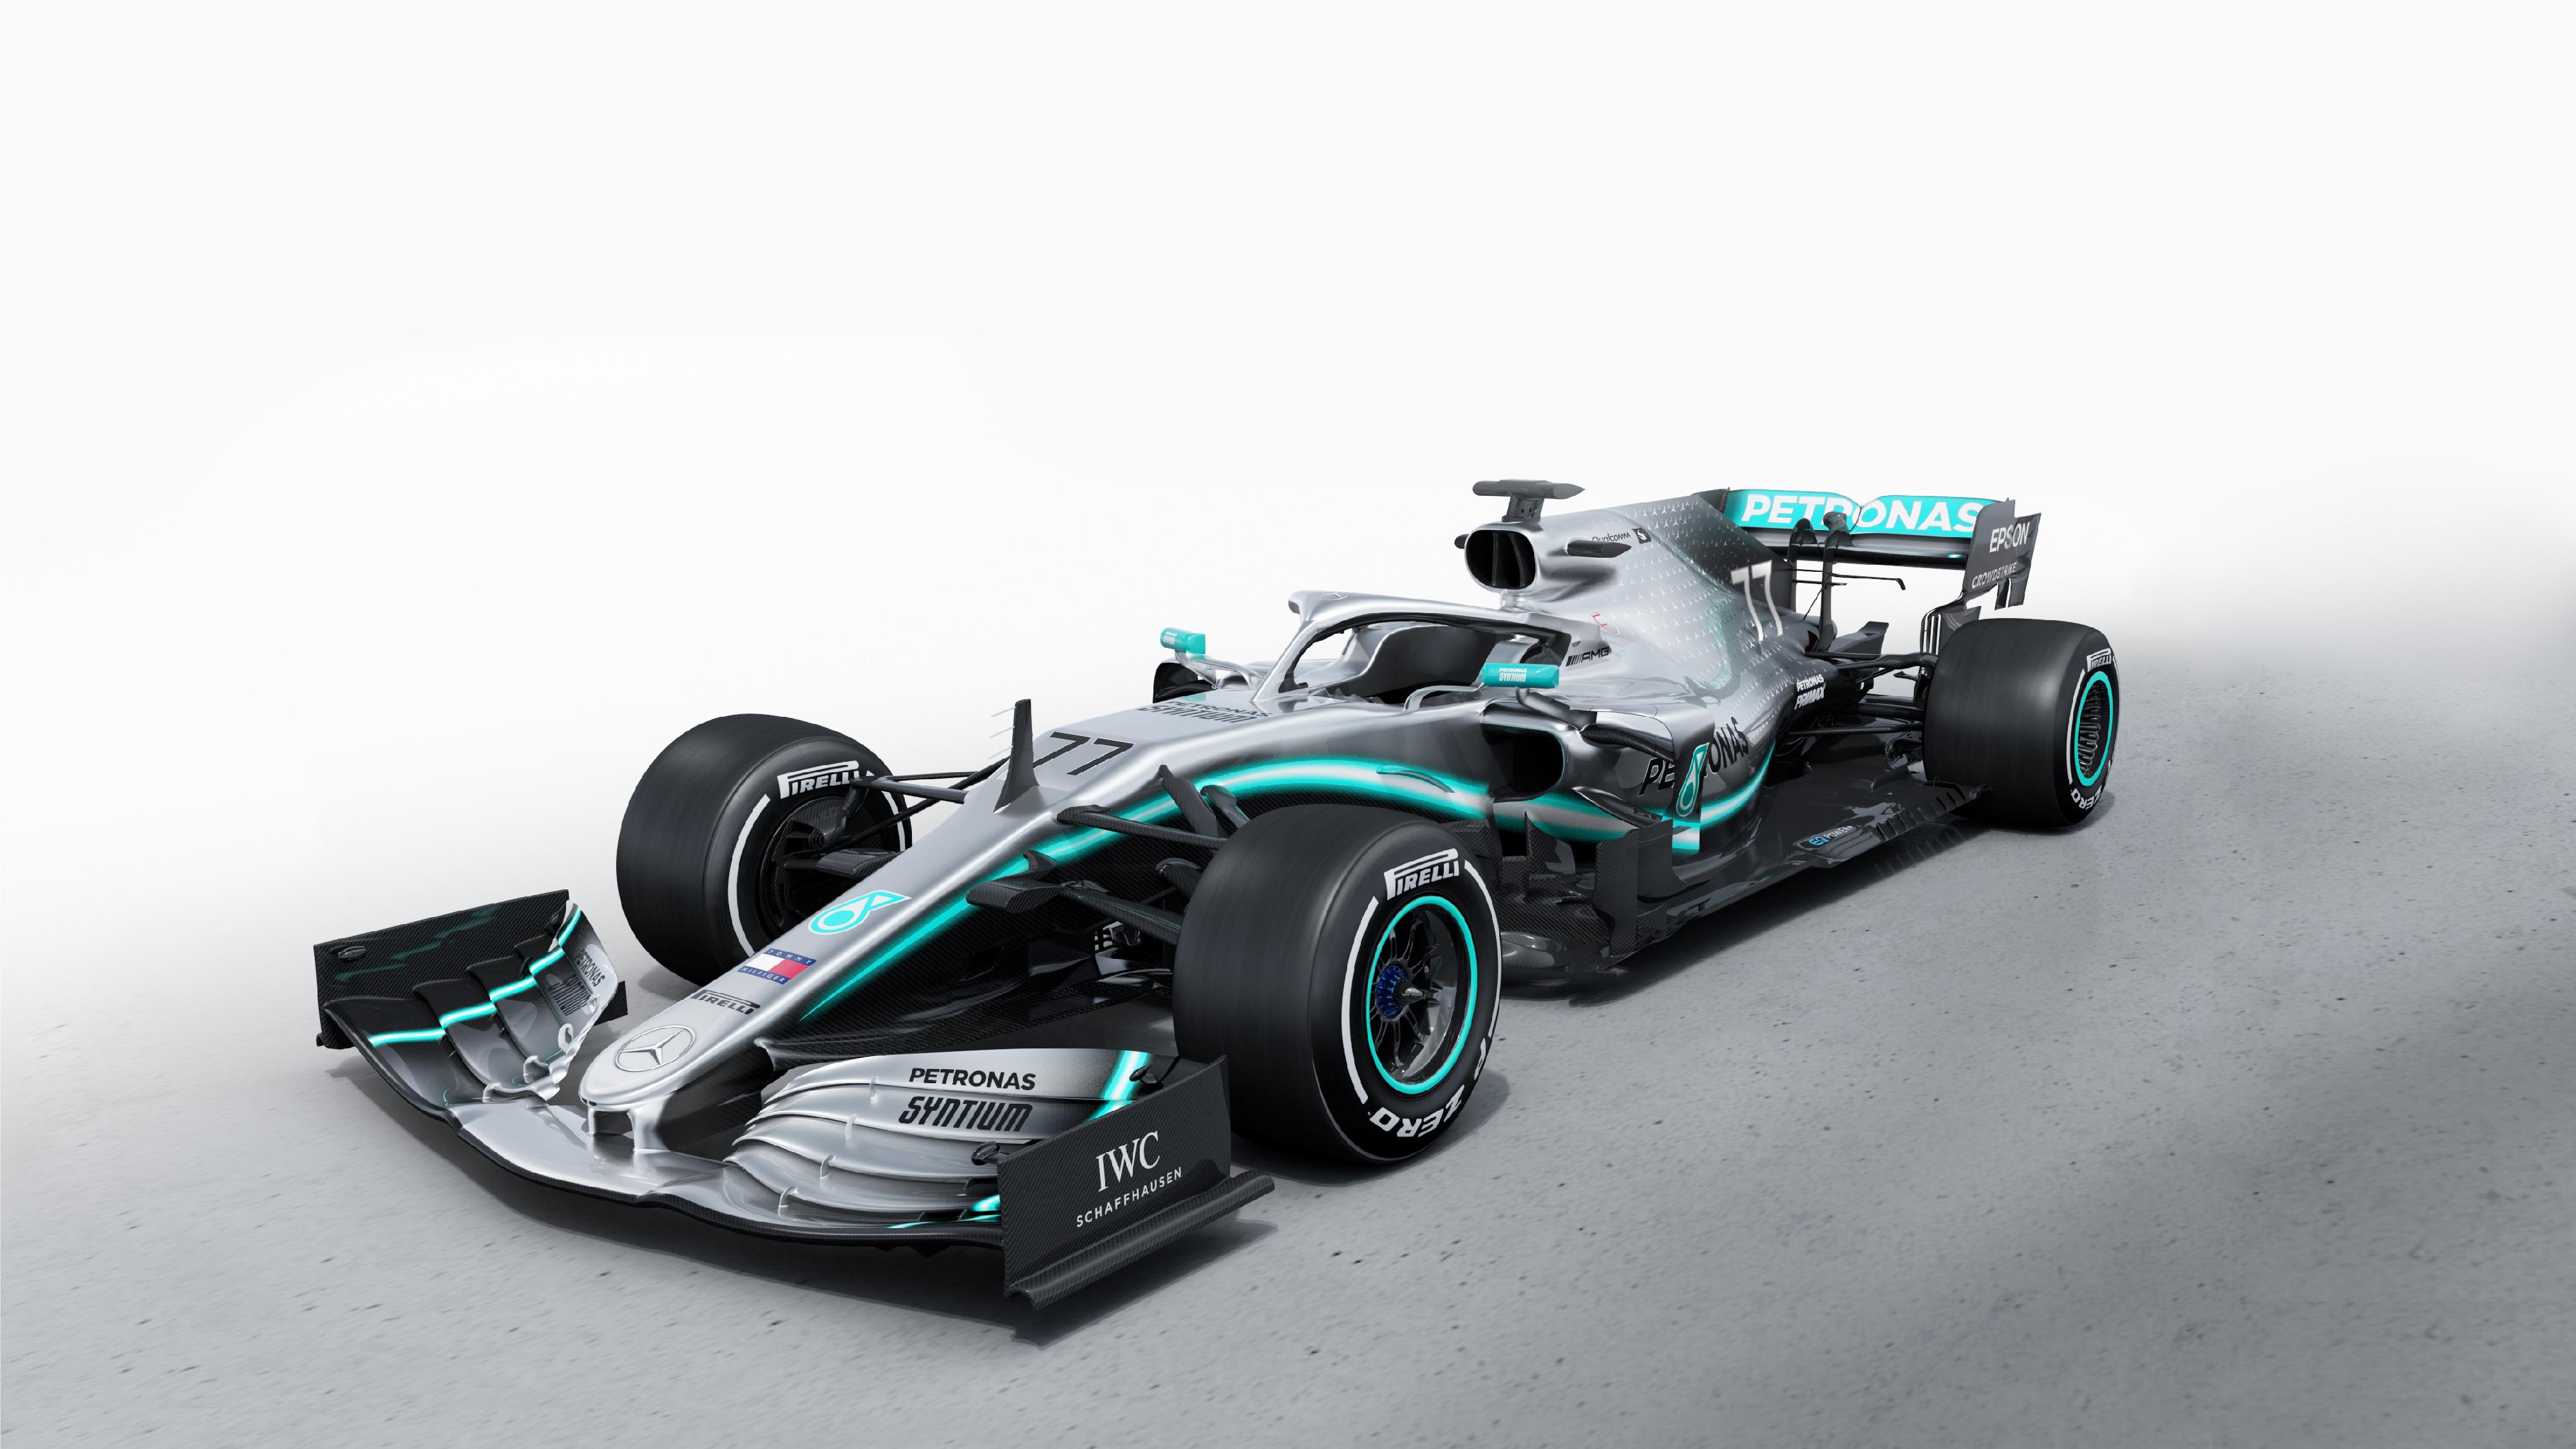 Mercedes Amg F1 W10 Eq Power 2019 4k 2 Wallpaper Hd Car Wallpapers Id 12041